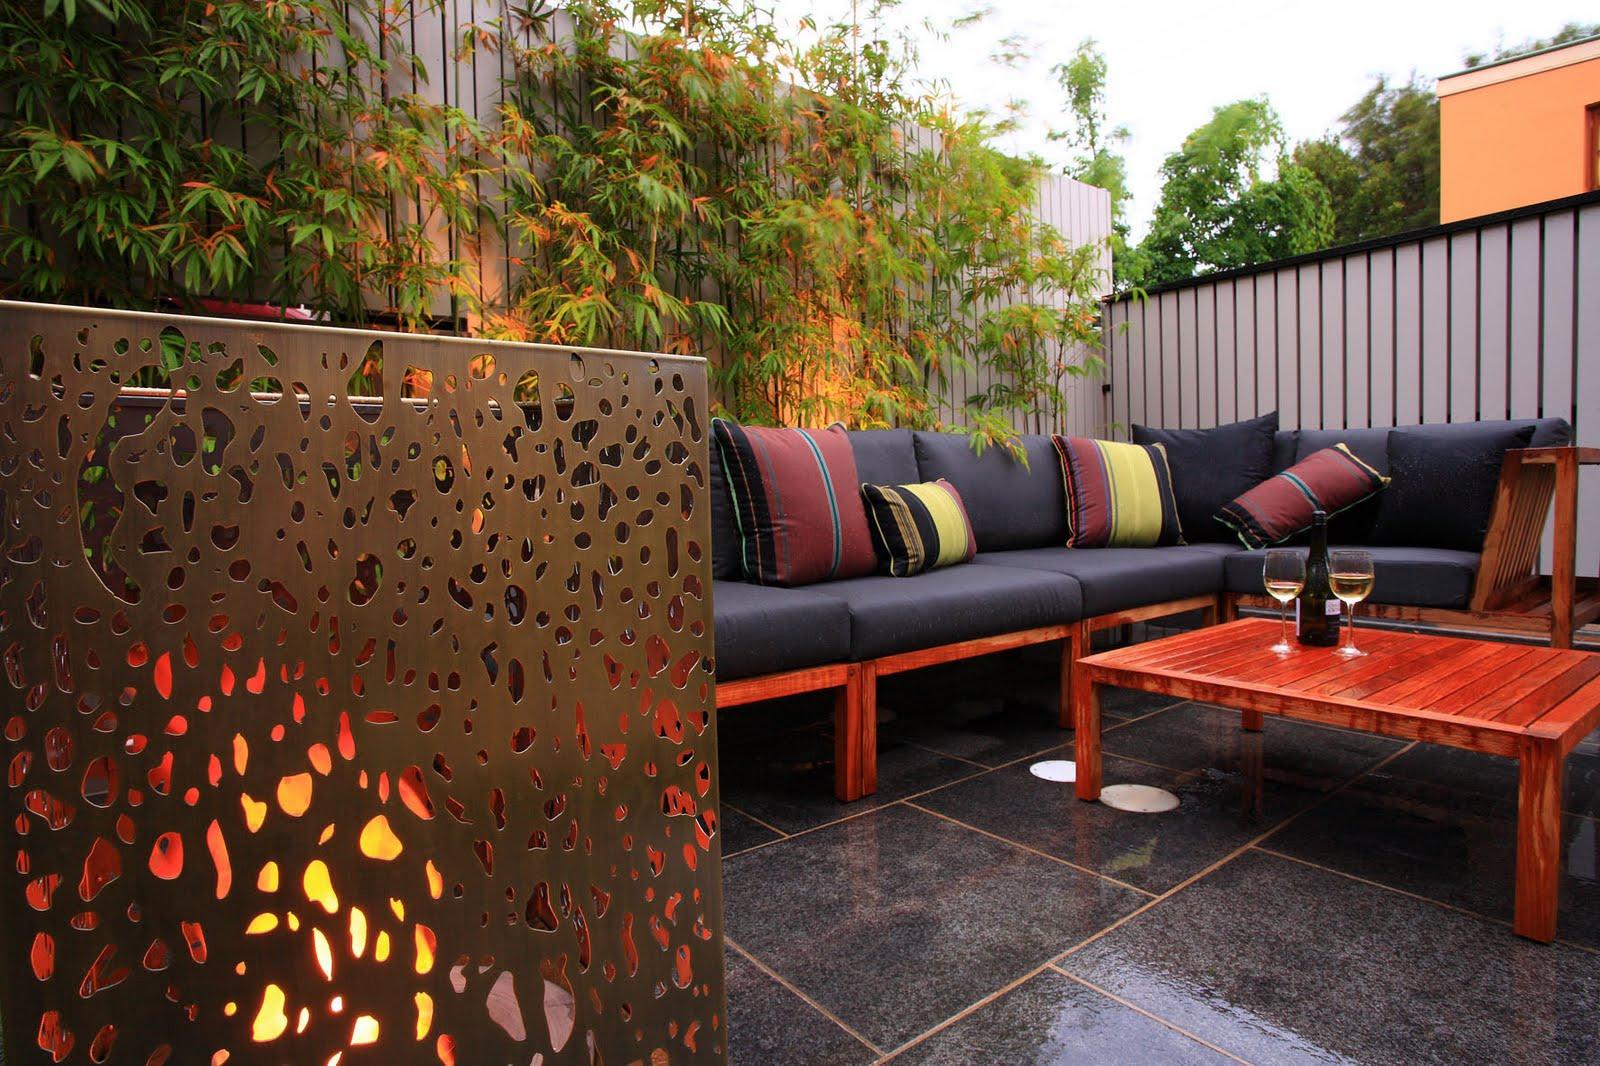 modern interior design ecosmart fireplaces lantern outdoor